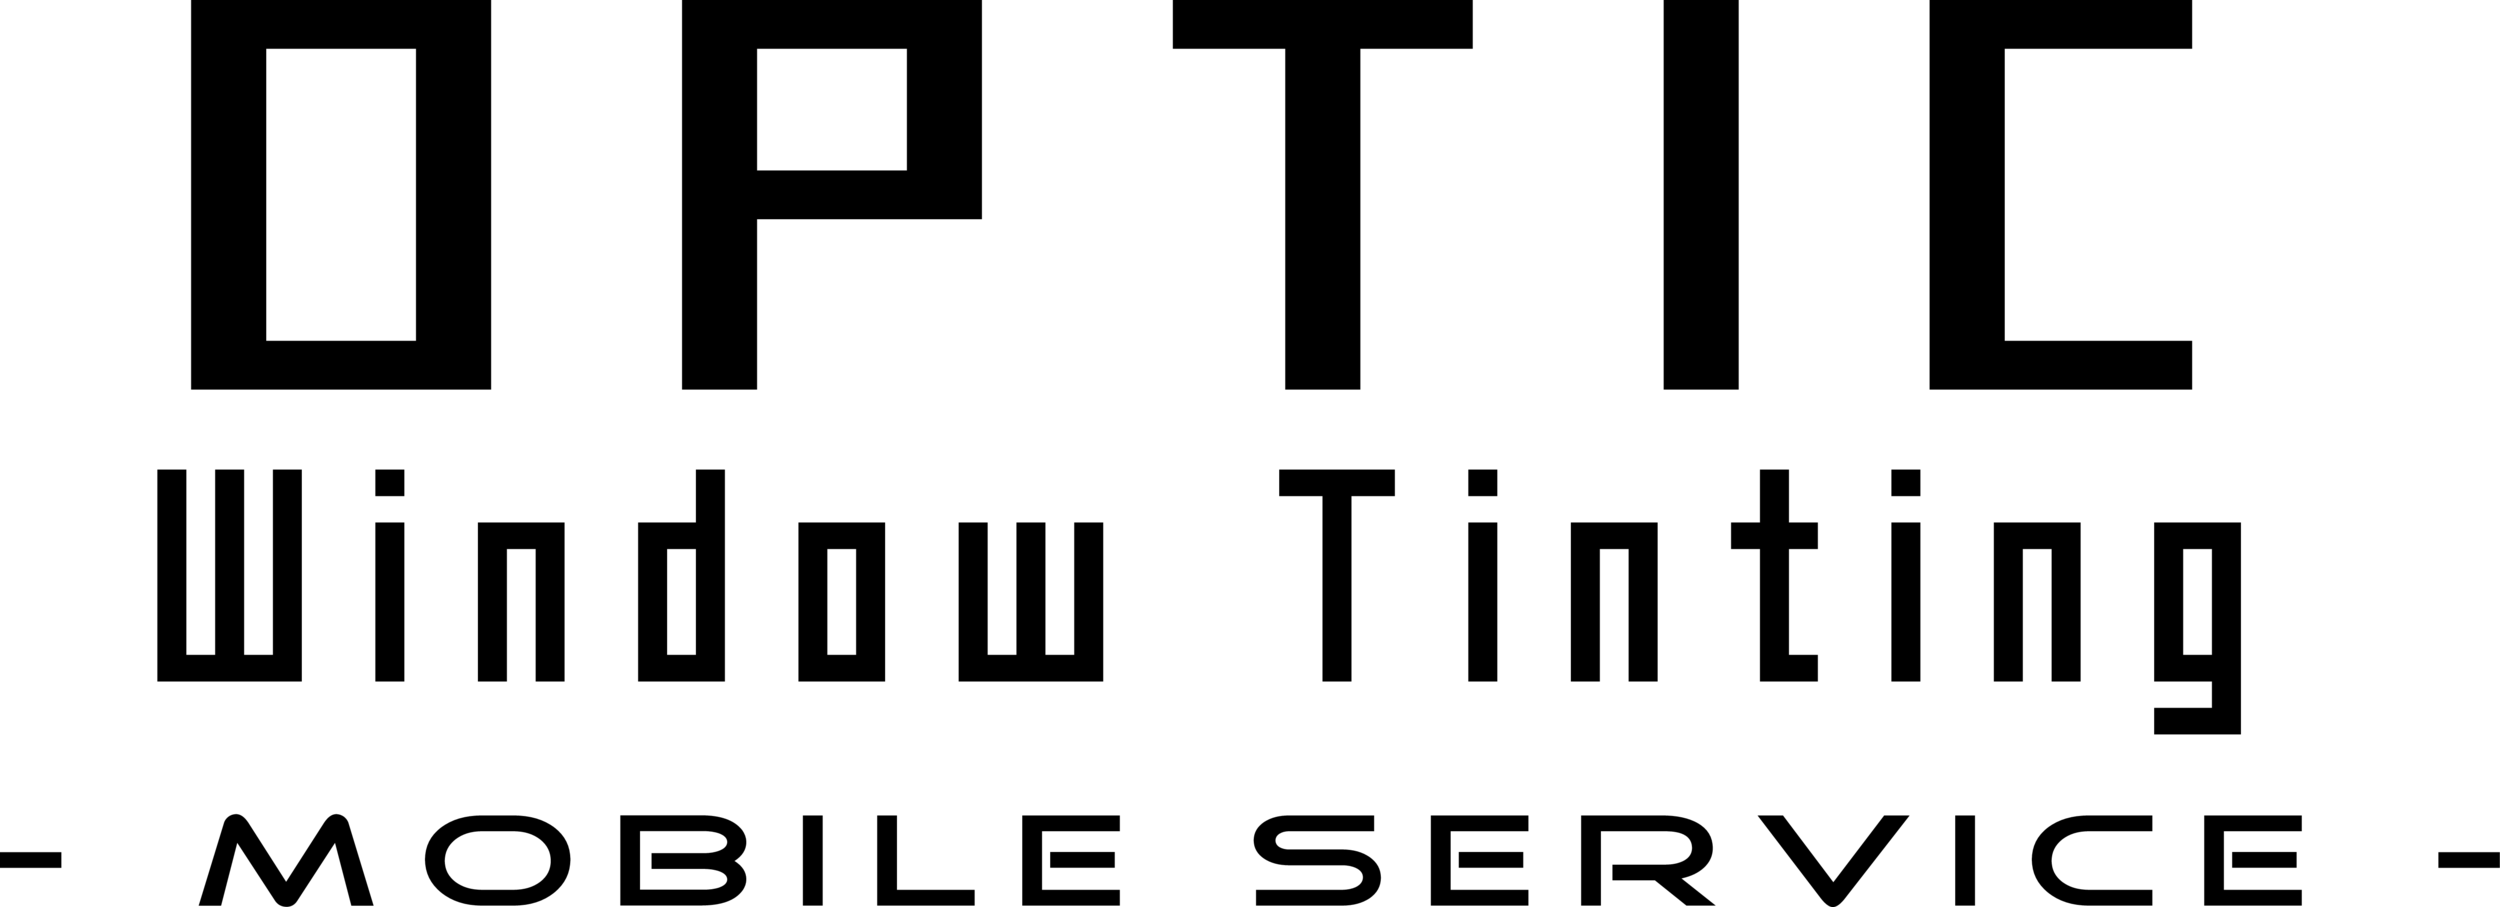 Optic_Logo_2019.eps.png